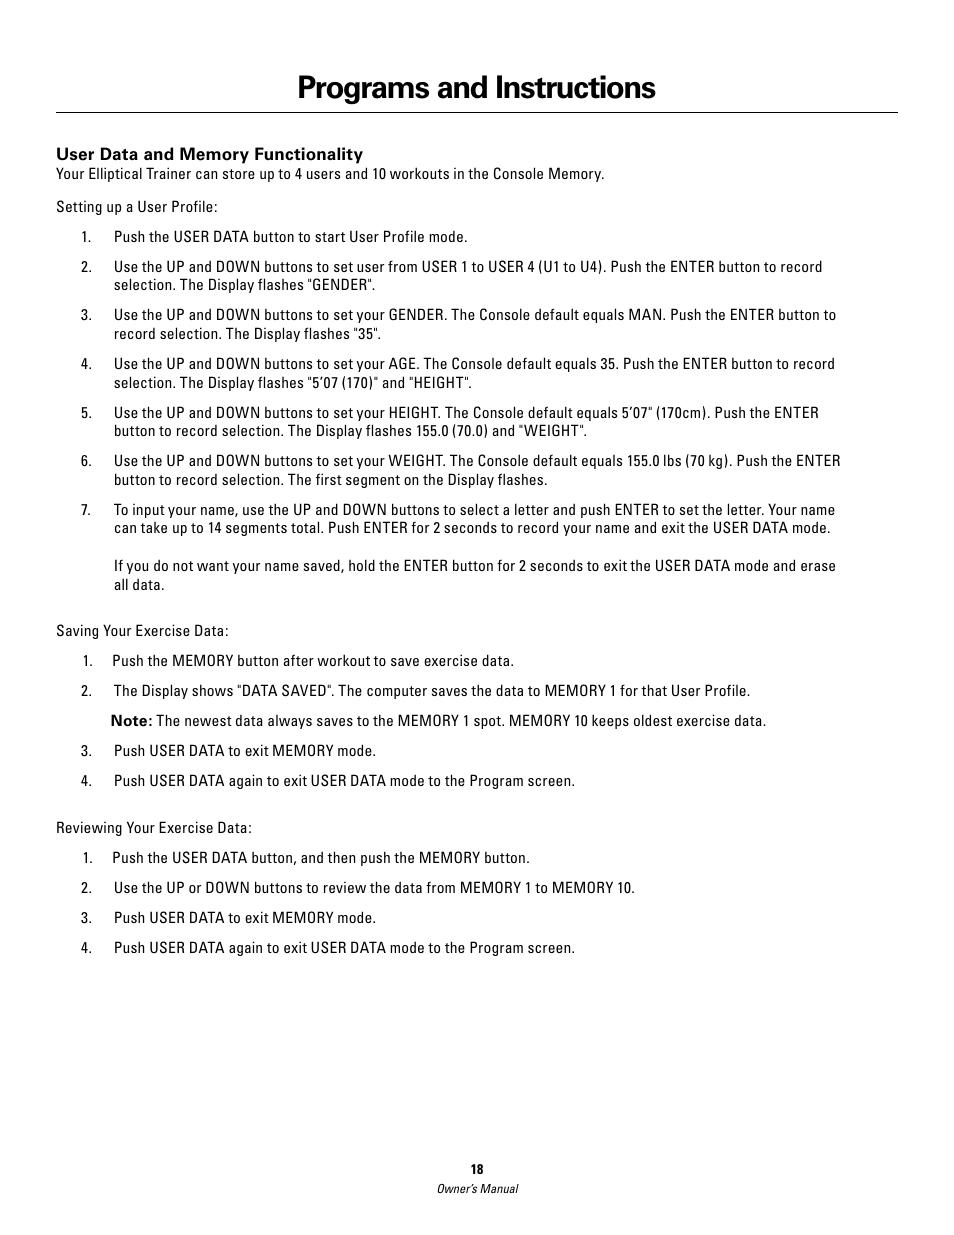 programs and instructions schwinn 420 user manual page 18 24 rh manualsdir com Schwinn 420 Elliptical Schwinn 420 Elliptical